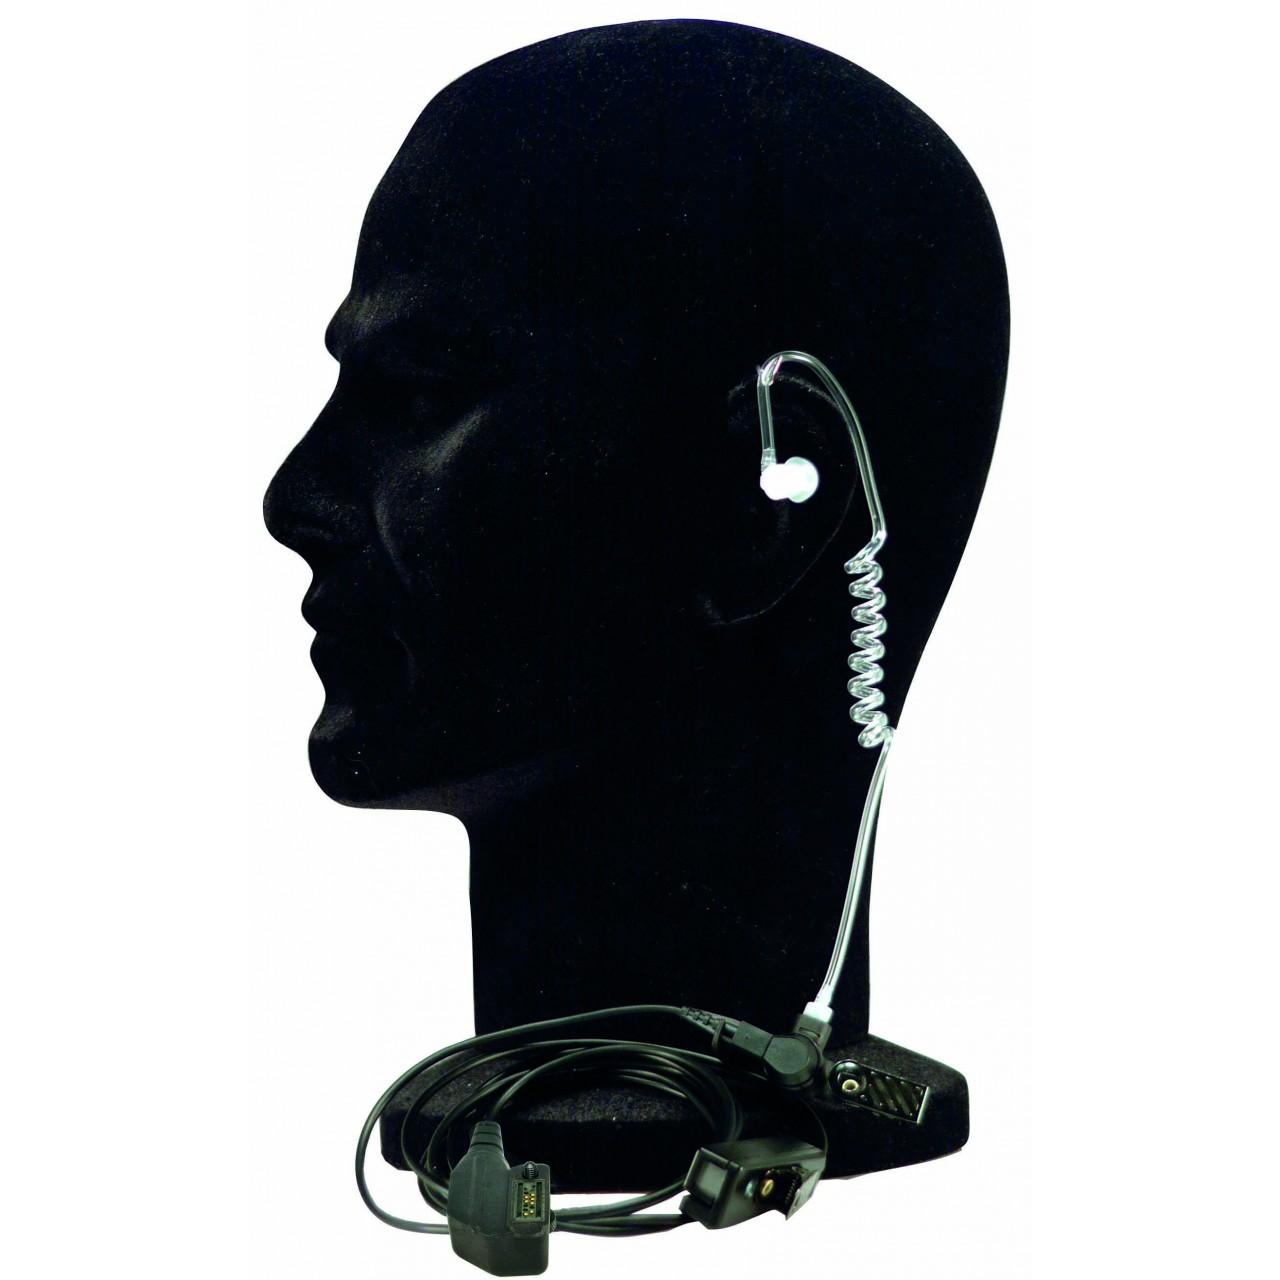 EP-OT10938 Headsets and earphones - ICOM